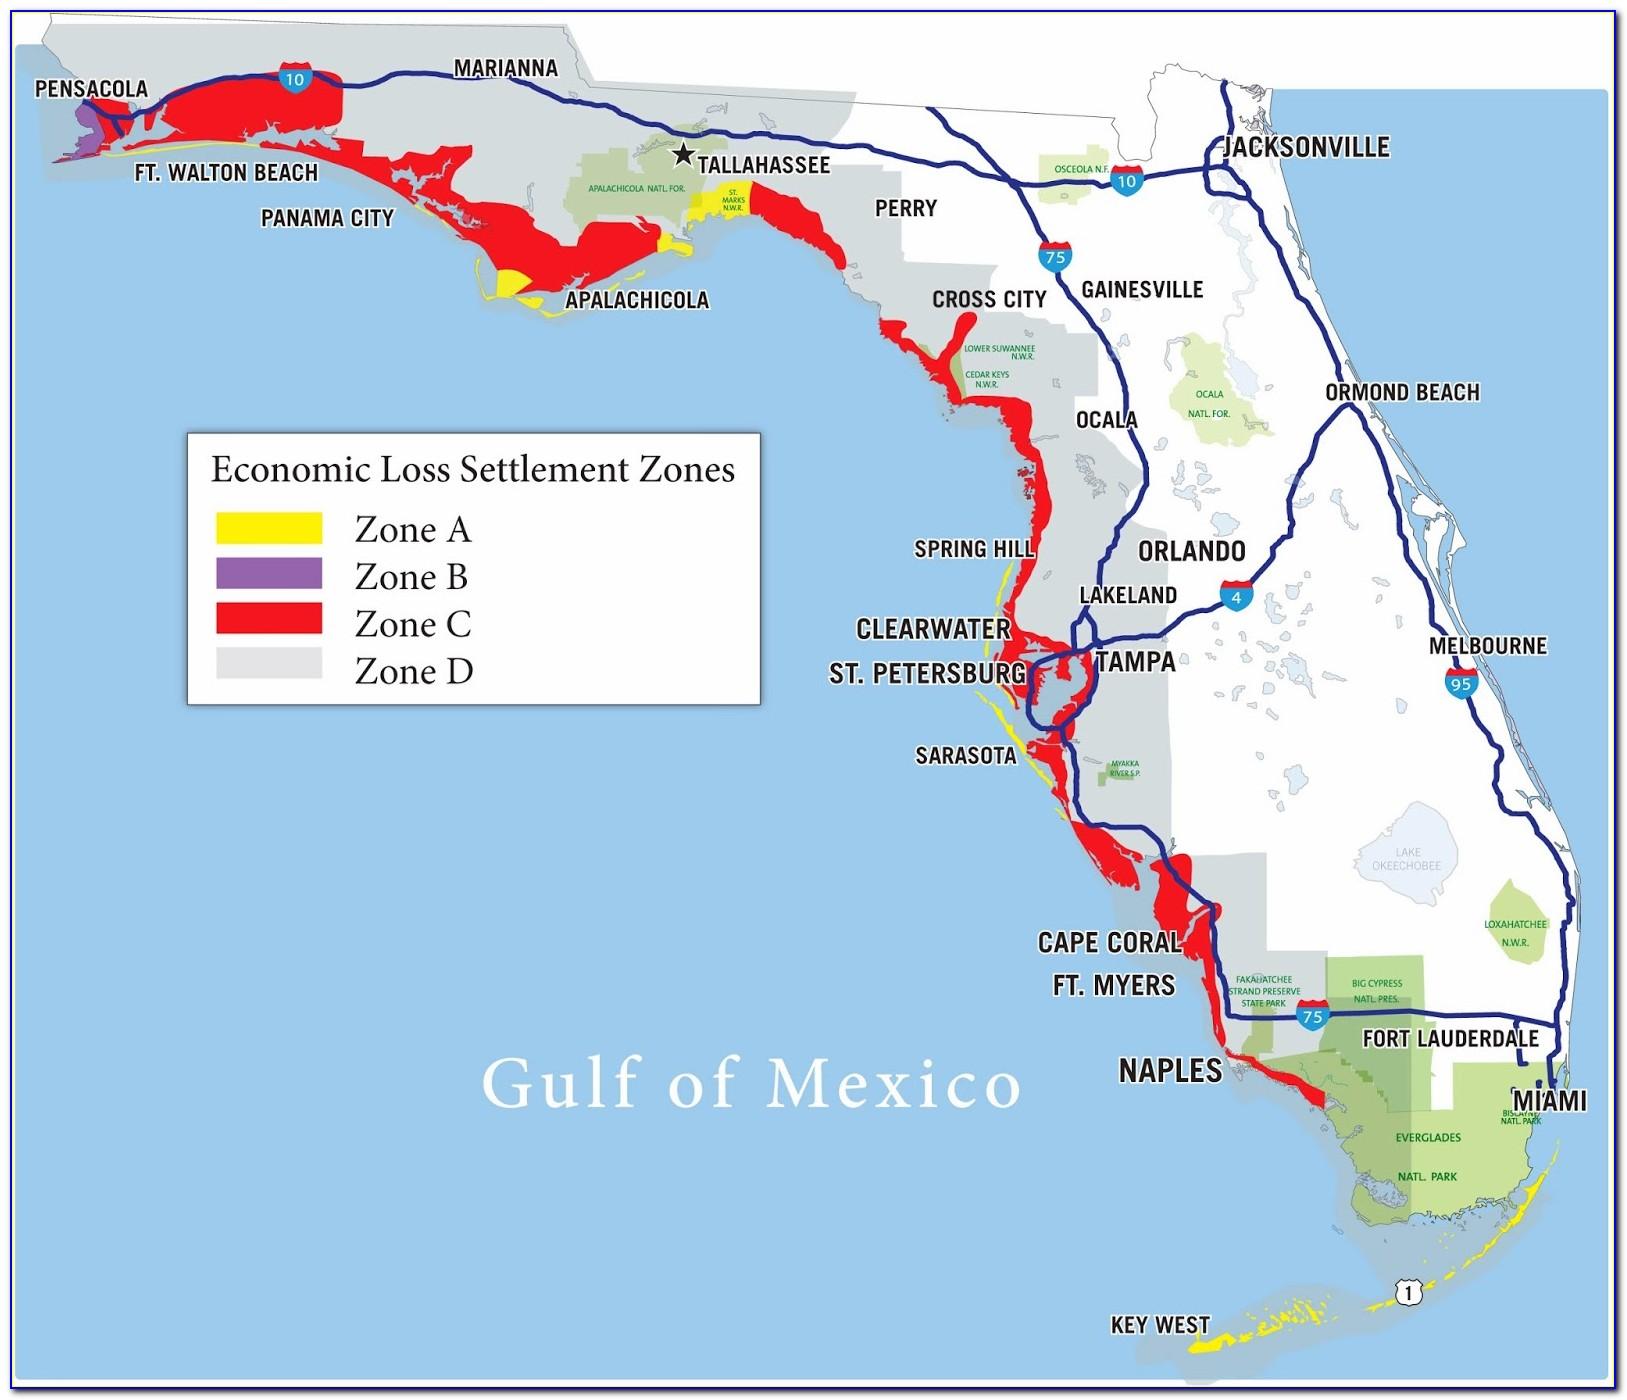 Fema Flood Zone Map Orlando Florida